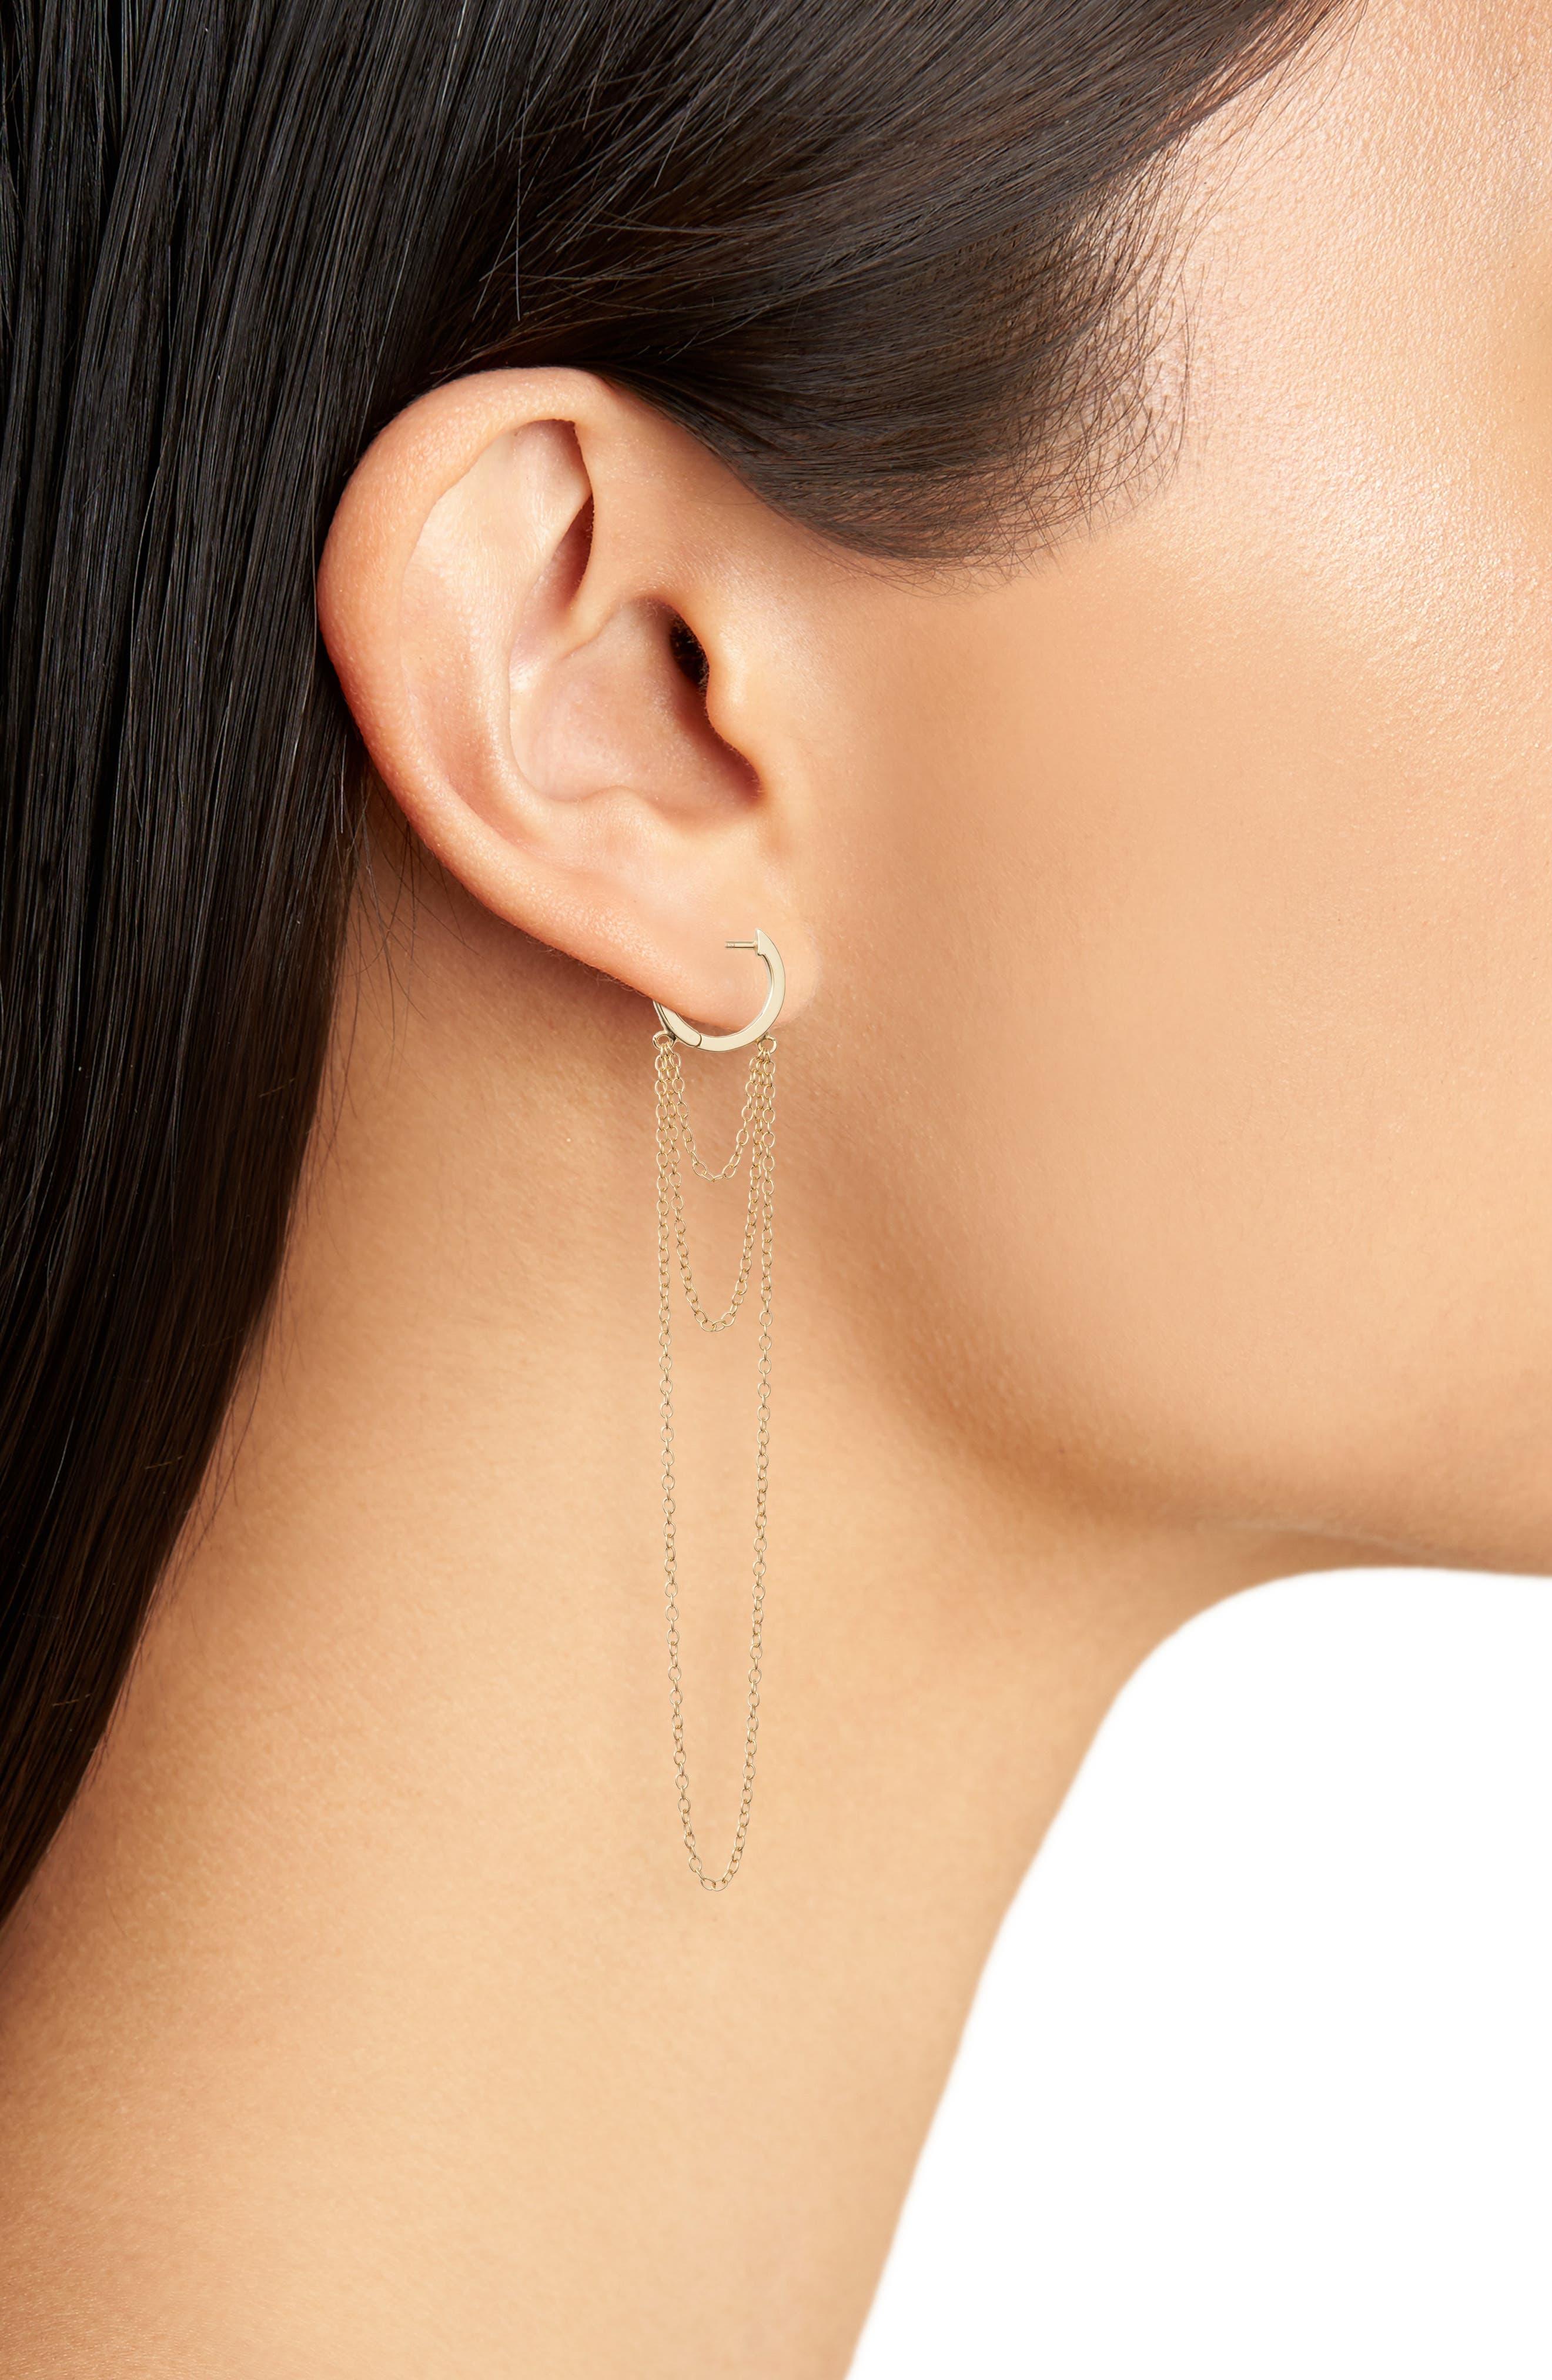 Elmar Huggie Chain earrings,                             Alternate thumbnail 2, color,                             710